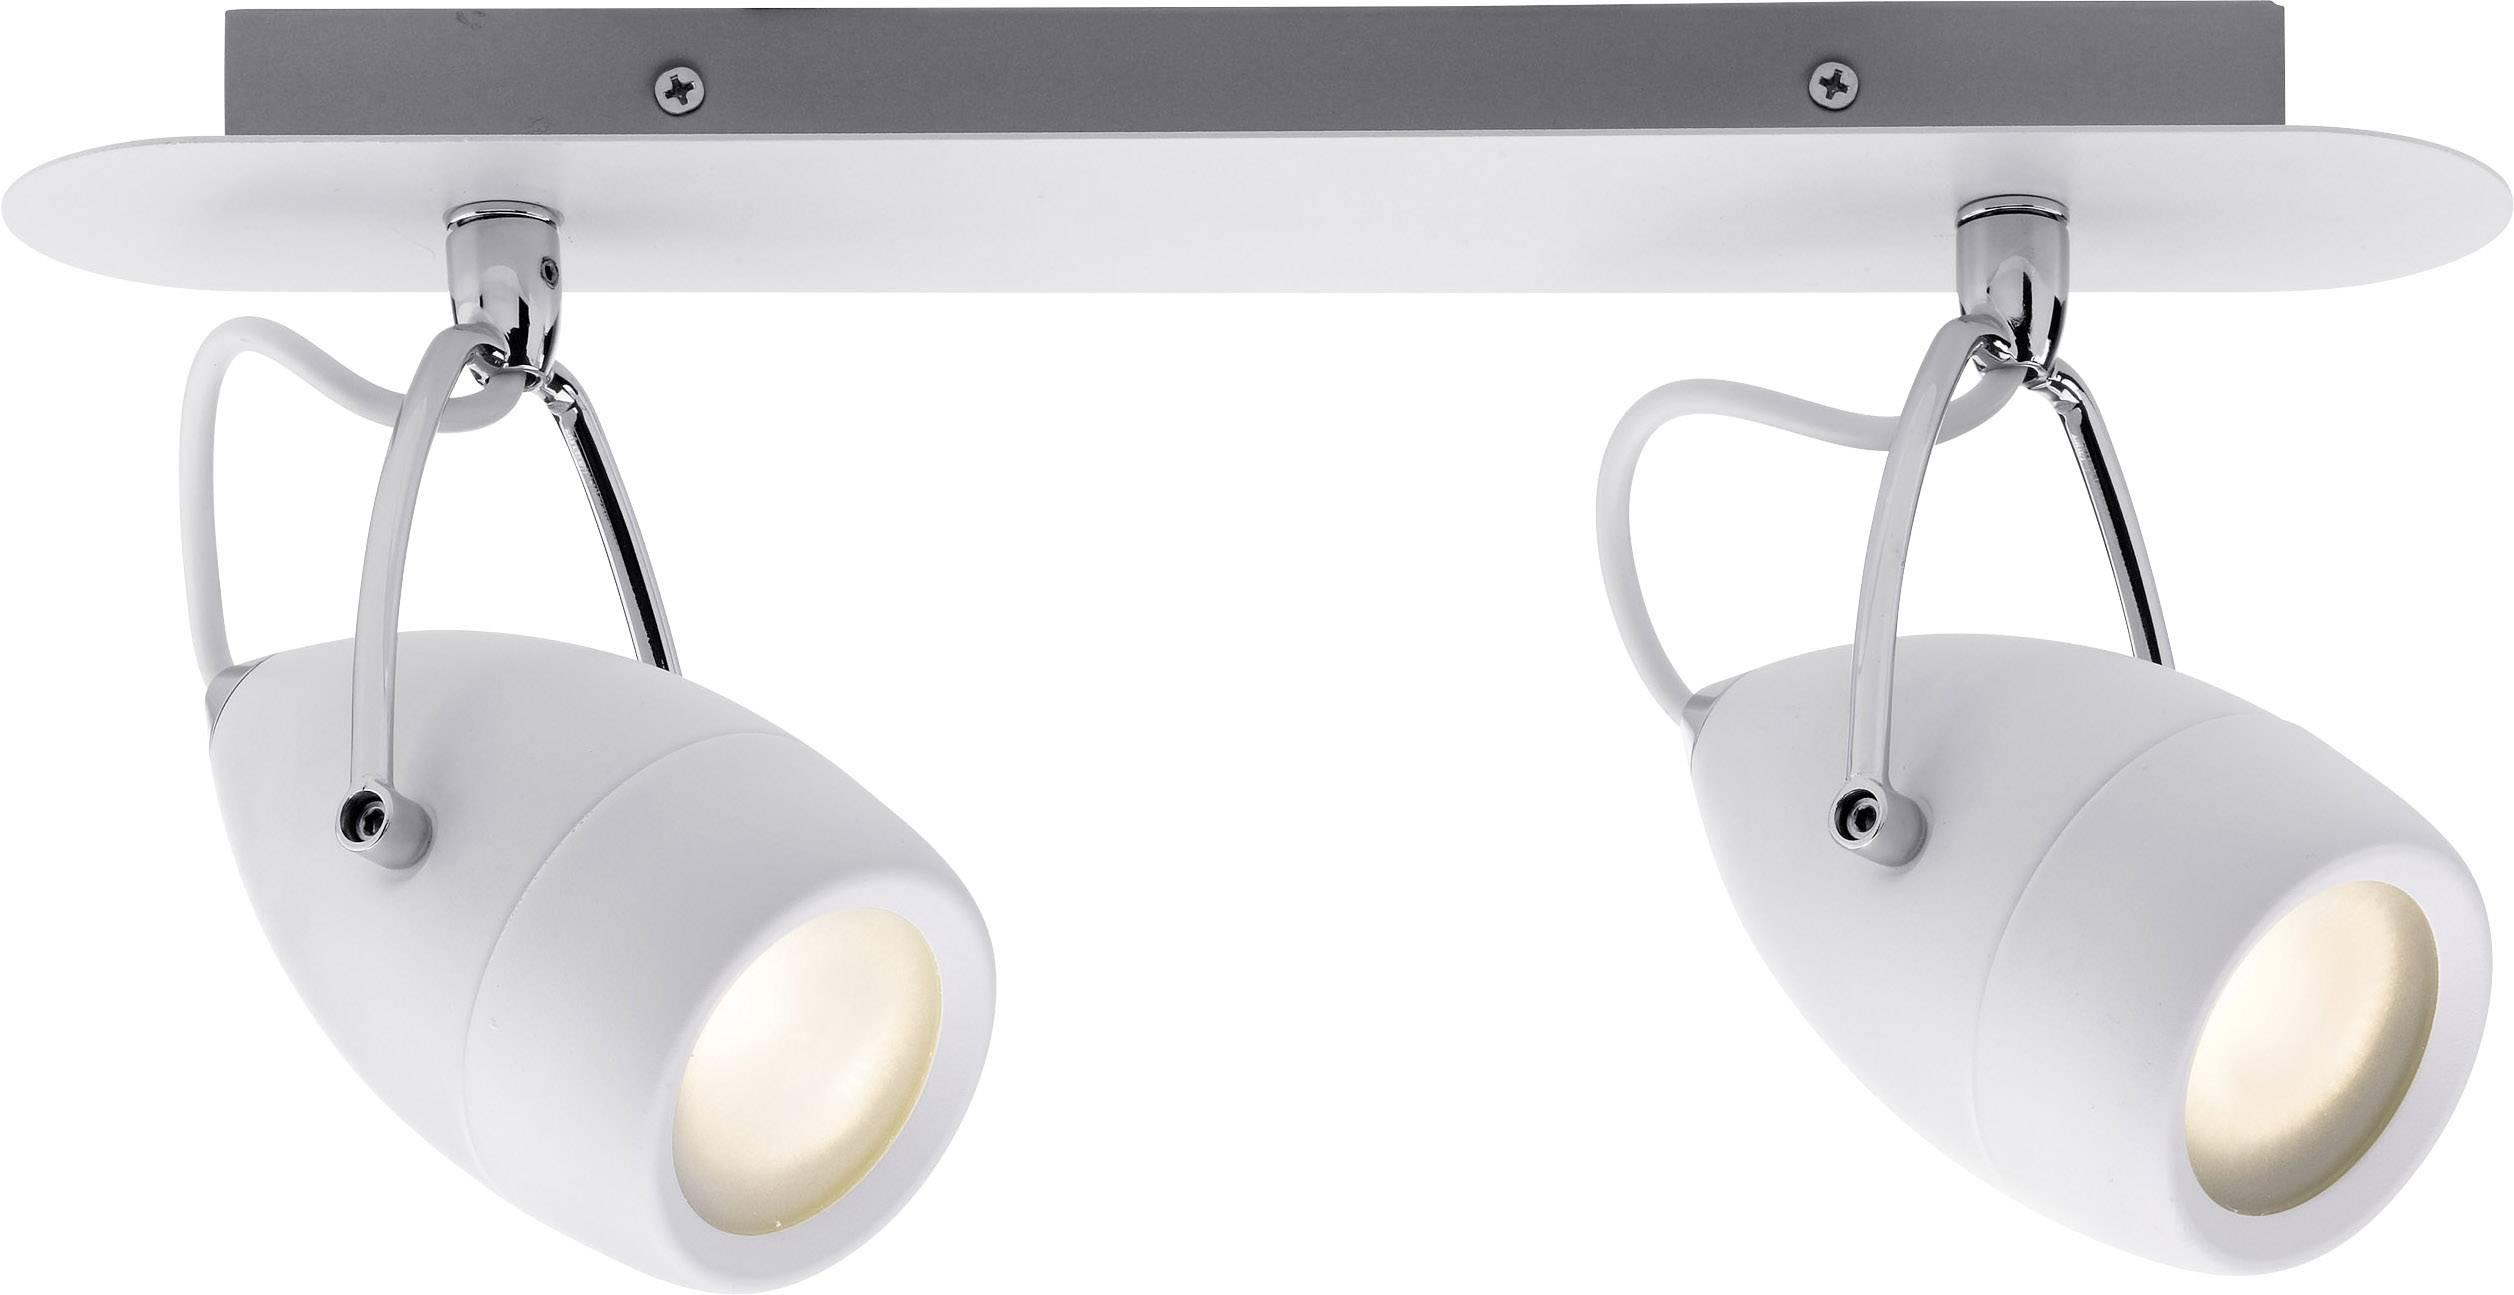 Badkamer Plafondlamp Led : Badkamer plafondlamp led gu w paulmann drop chroom wit